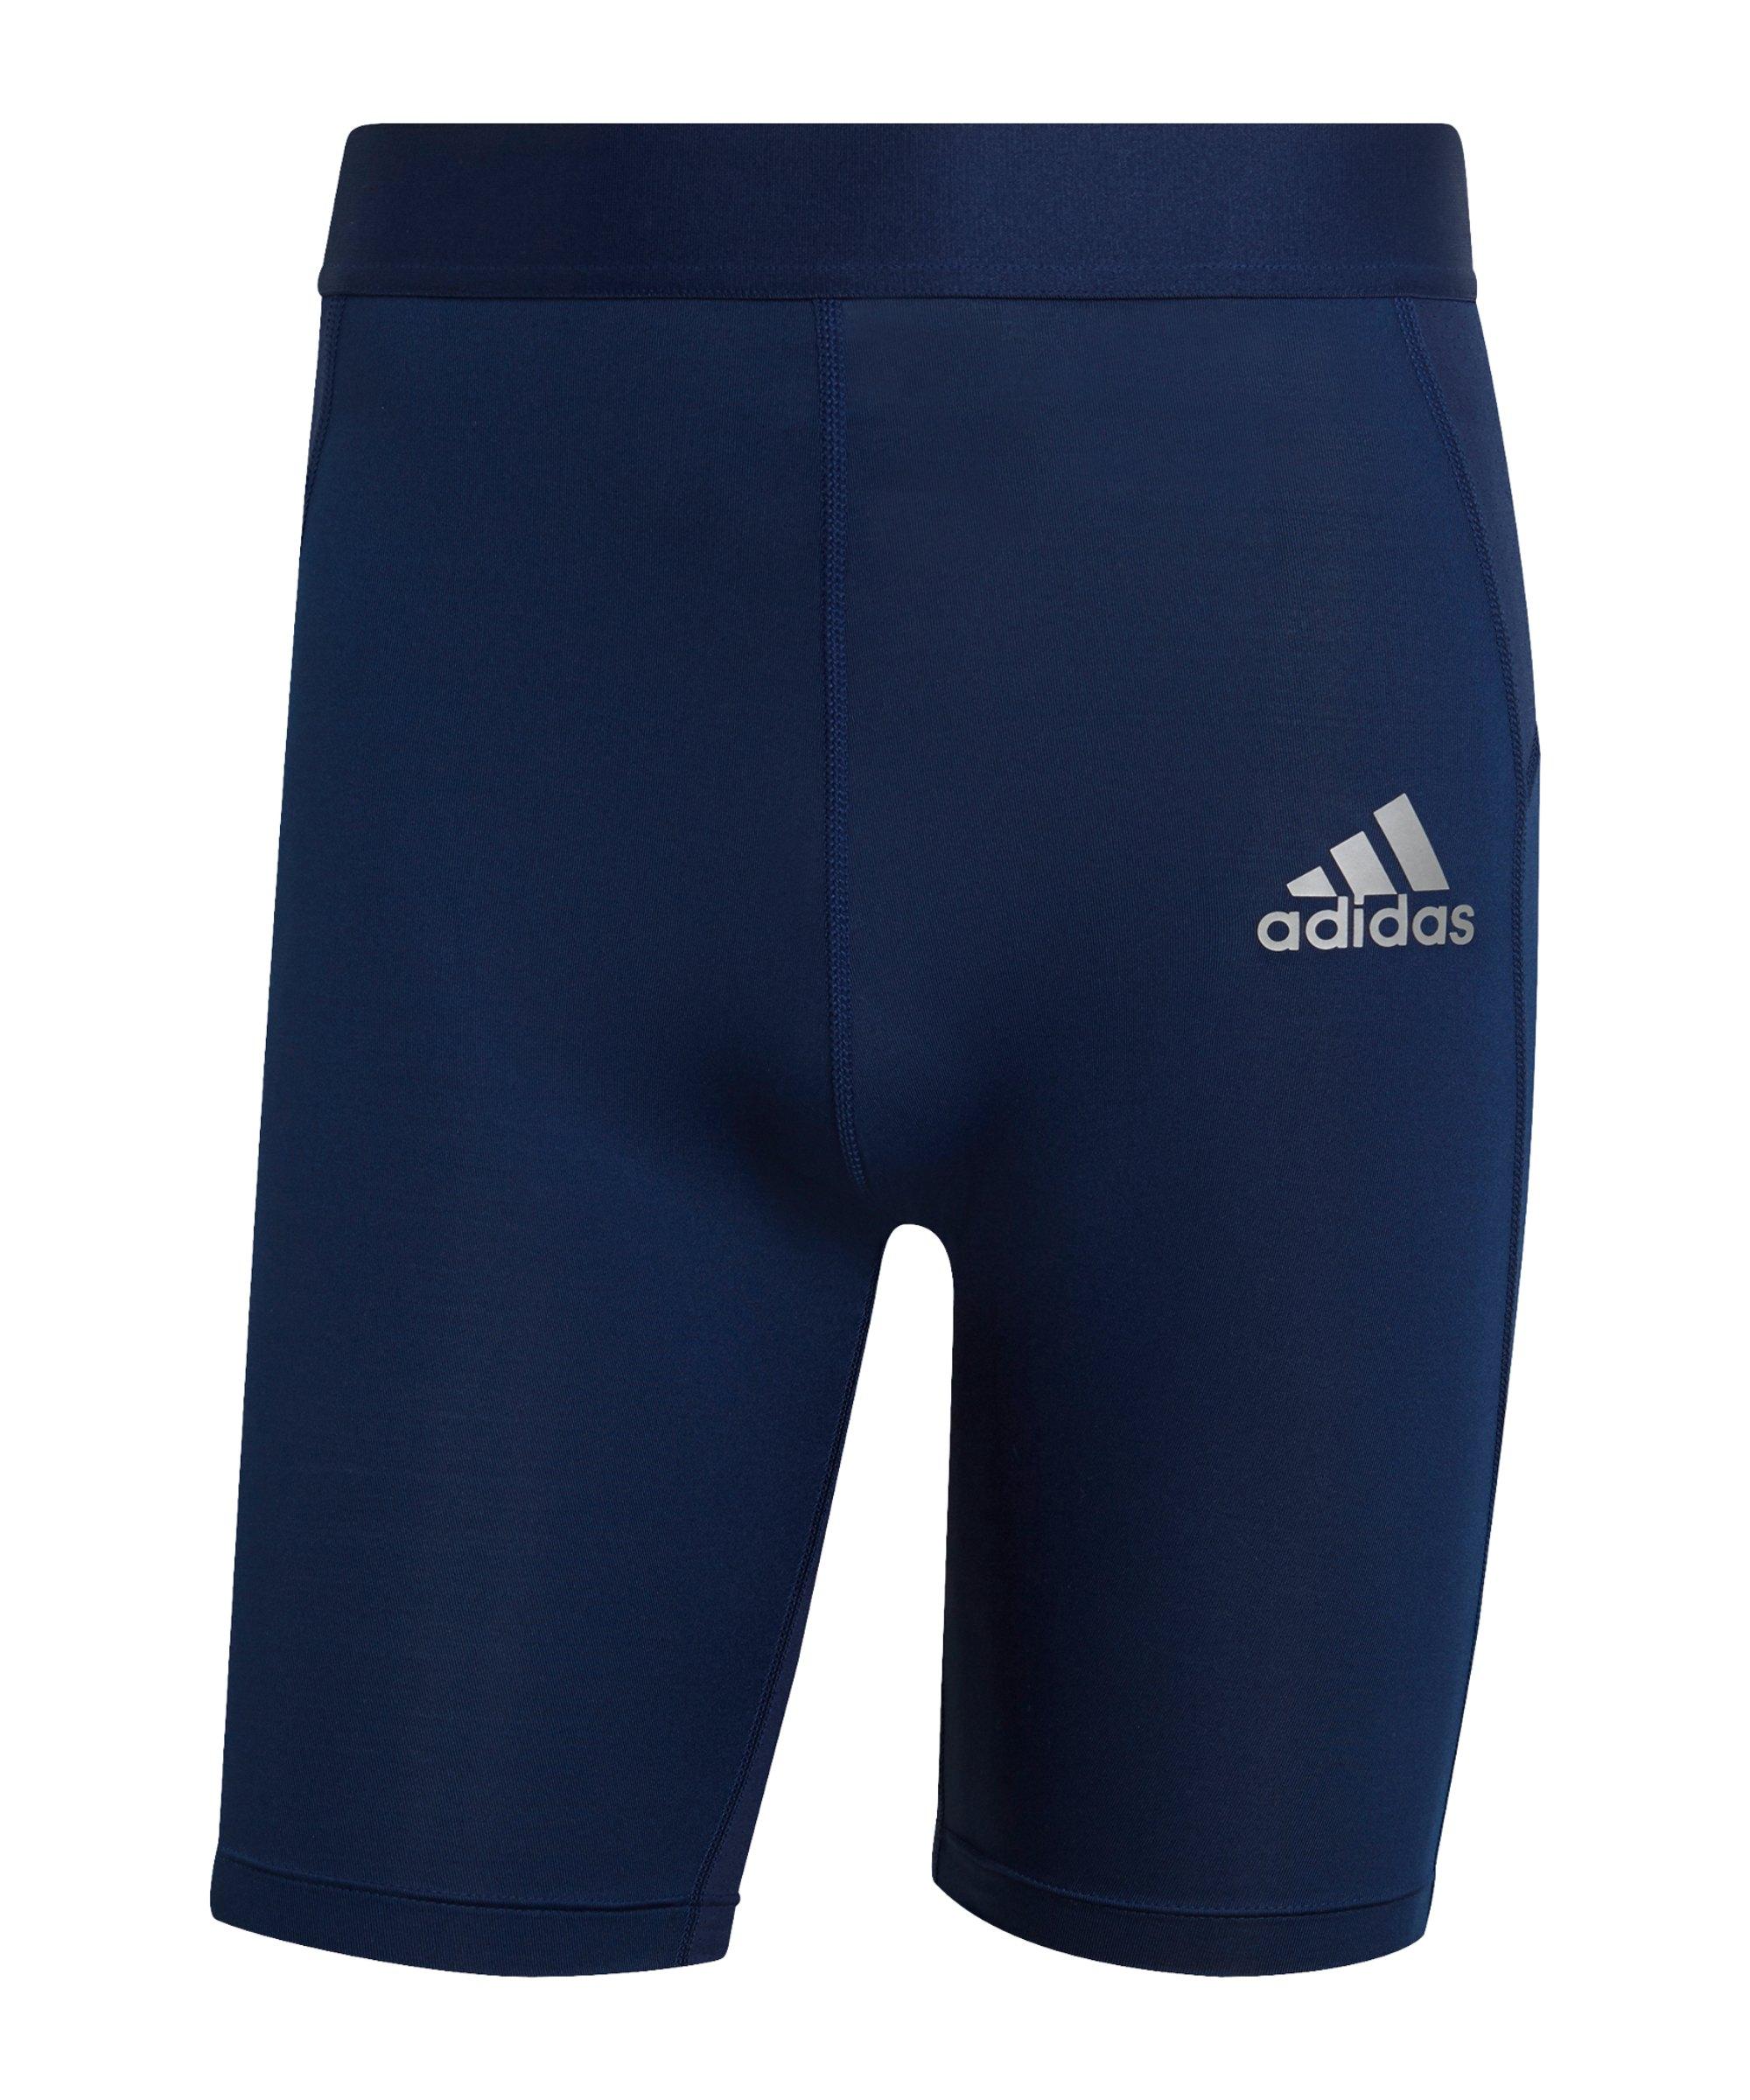 adidas Techfit Short Dunkelblau - blau